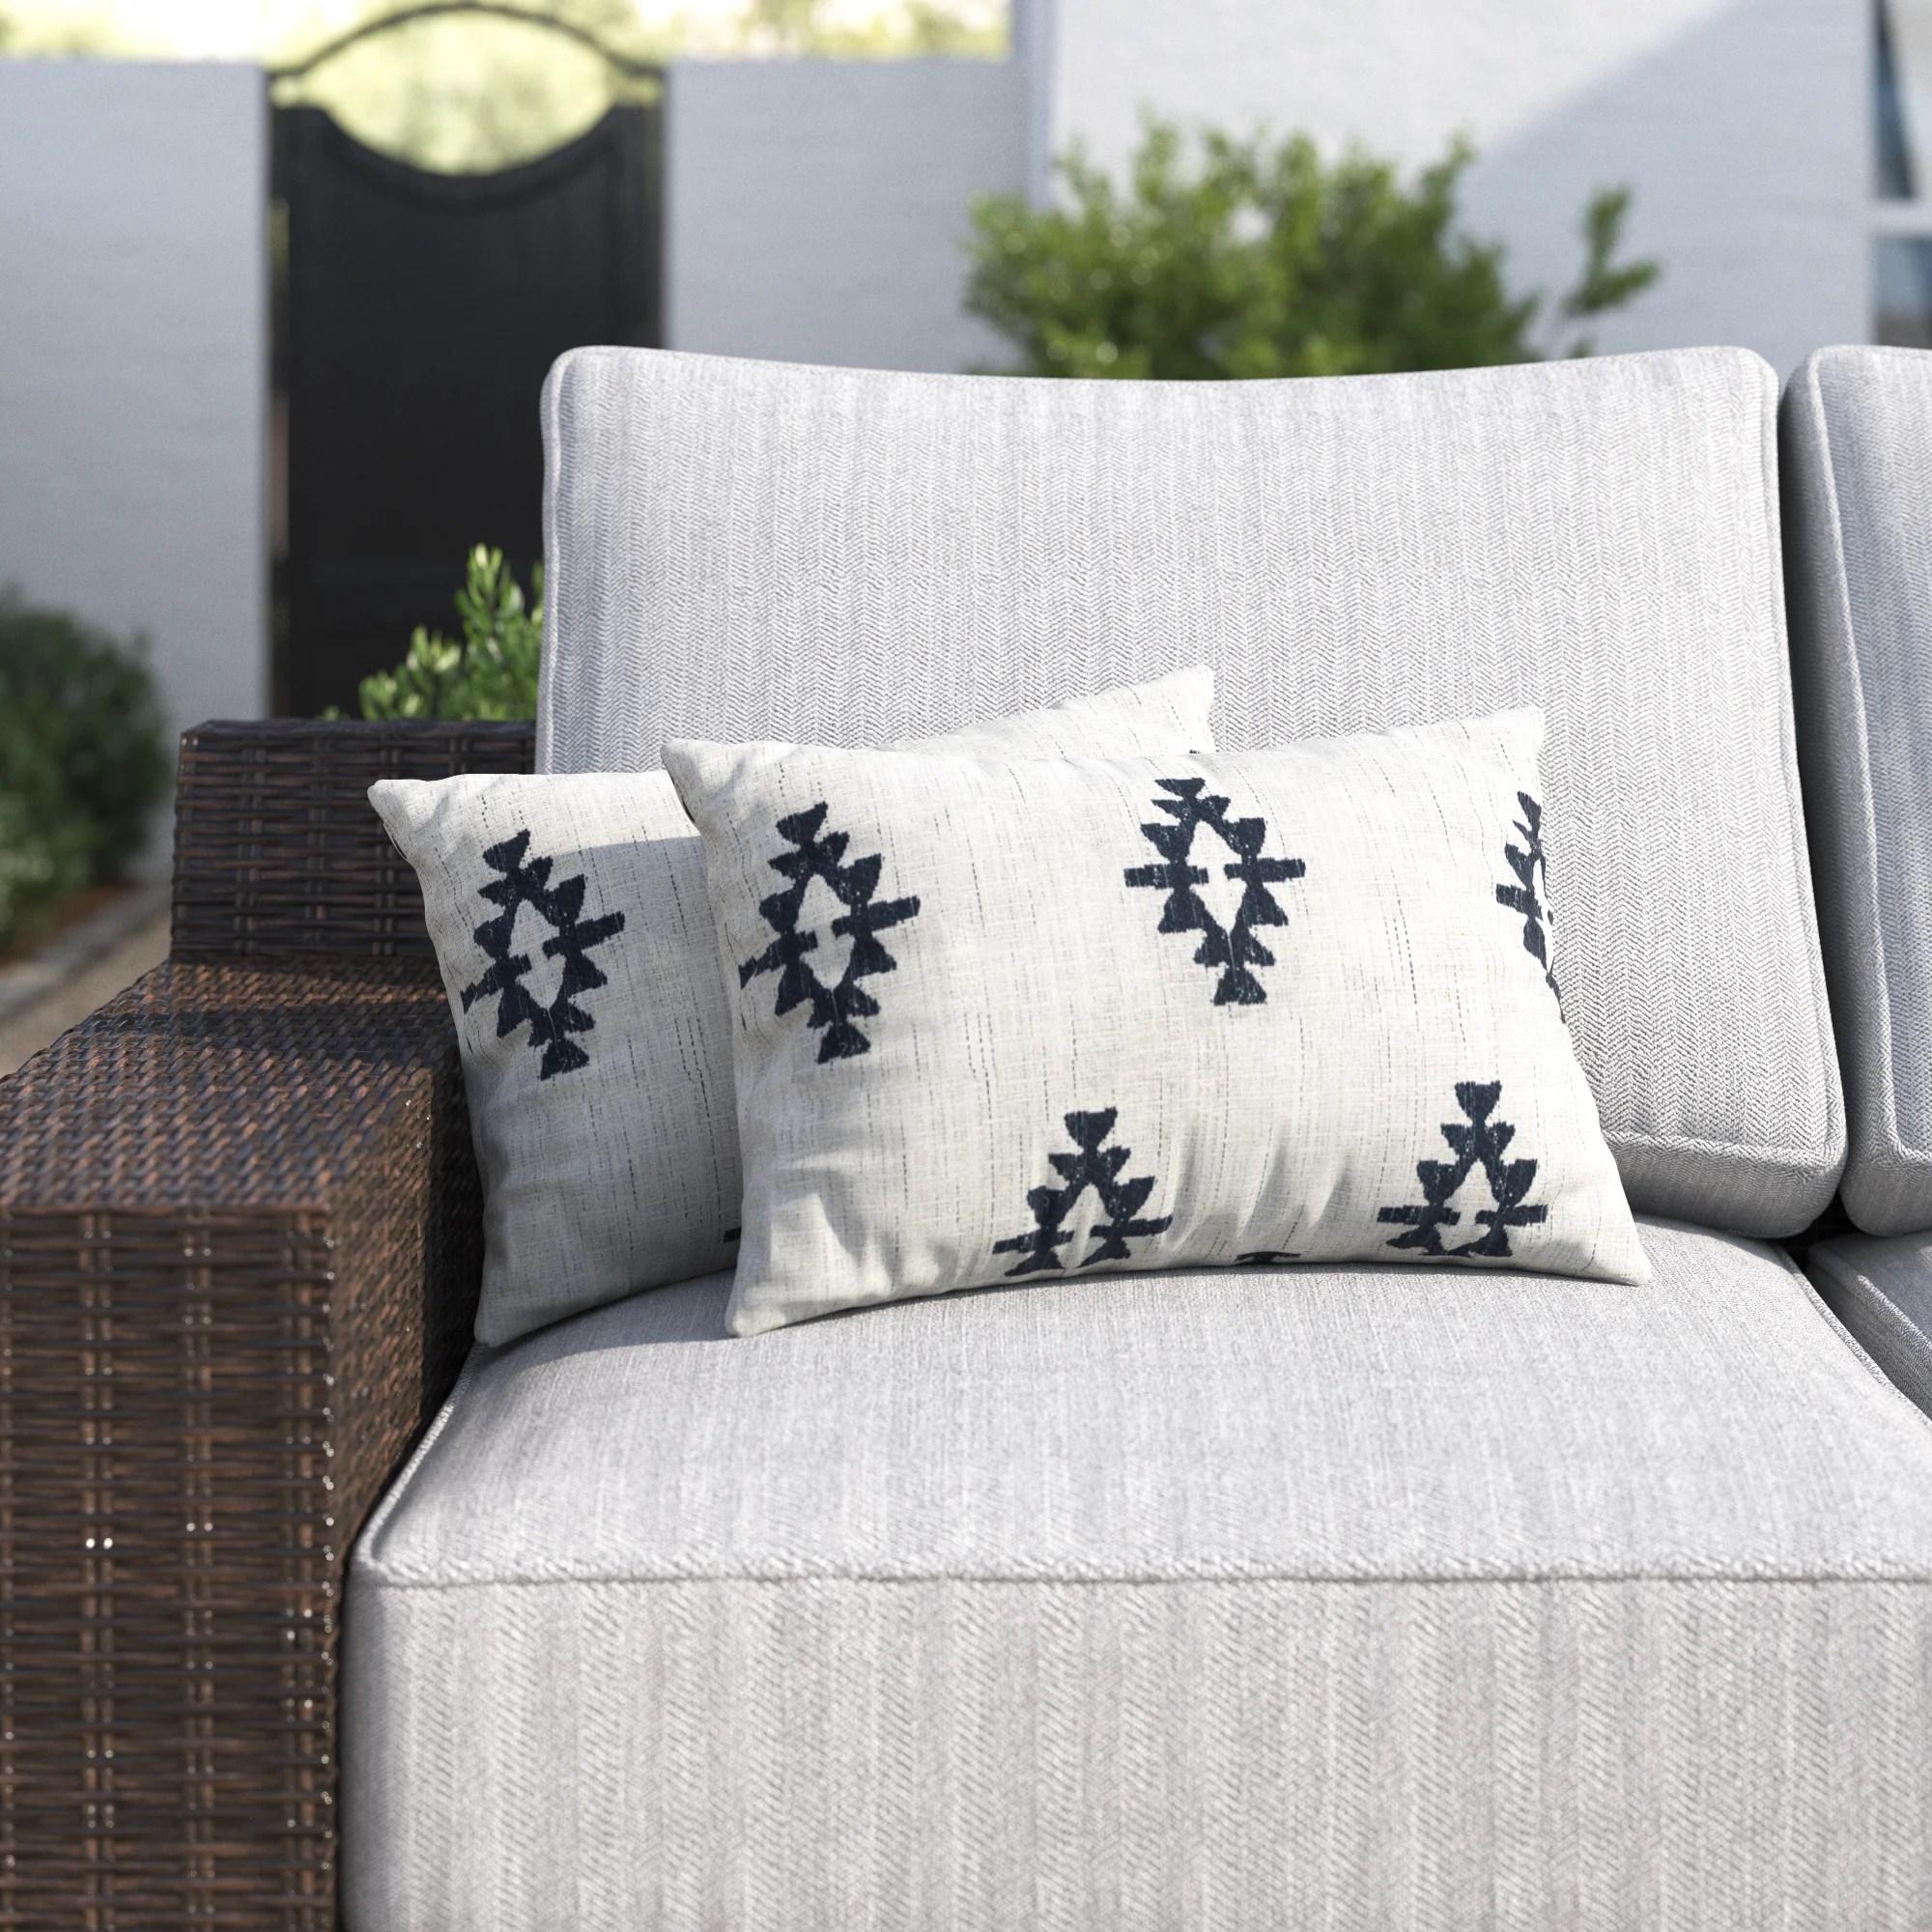 shah indoor outdoor lumbar pillow cover insert